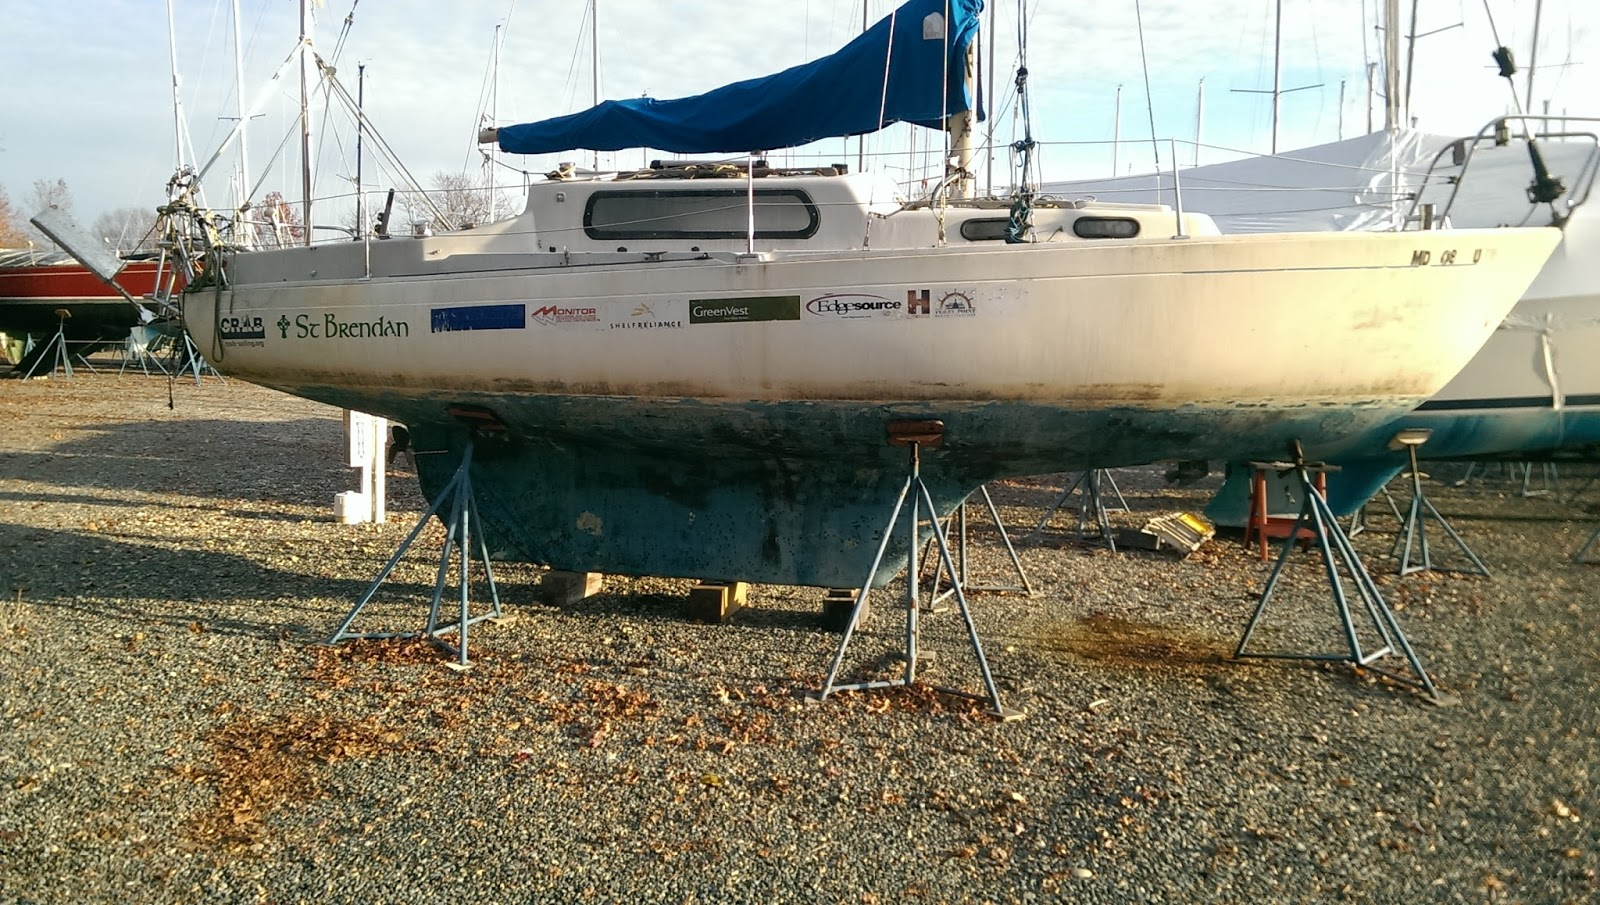 Northwest Passage - 2017 - Cruisers & Sailing Forums